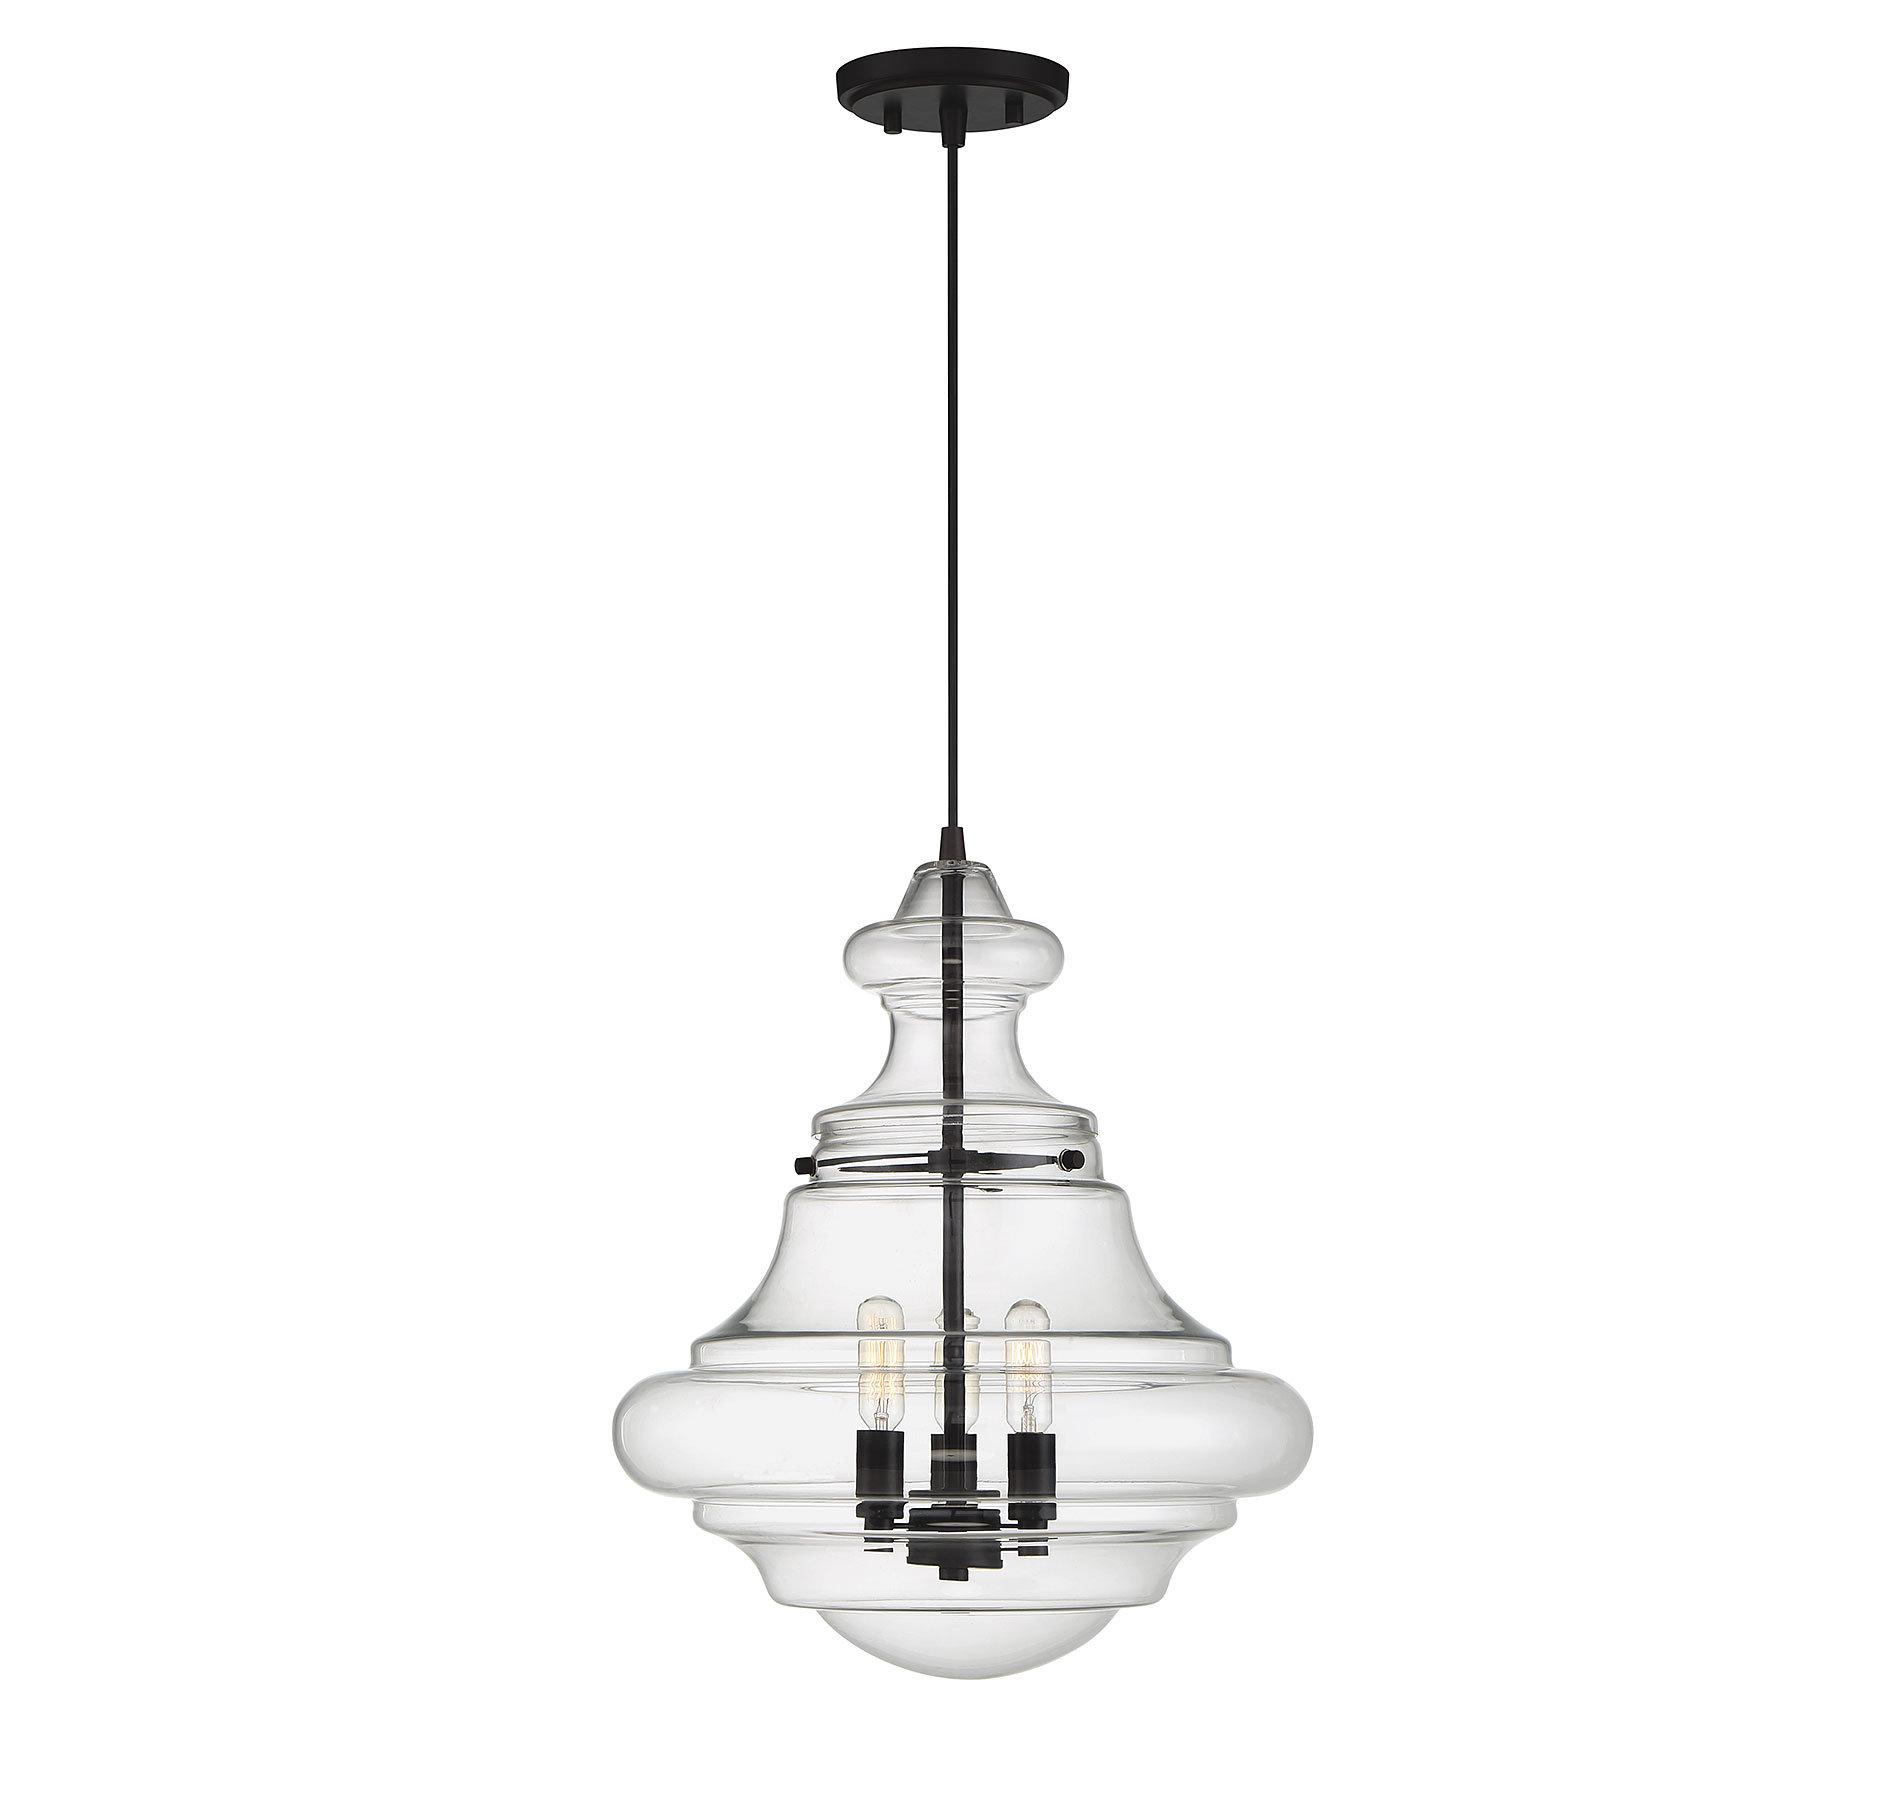 Edford 3 Light Single Schoolhouse Pendant In Akakios 1 Light Single Bell Pendants (Image 12 of 30)